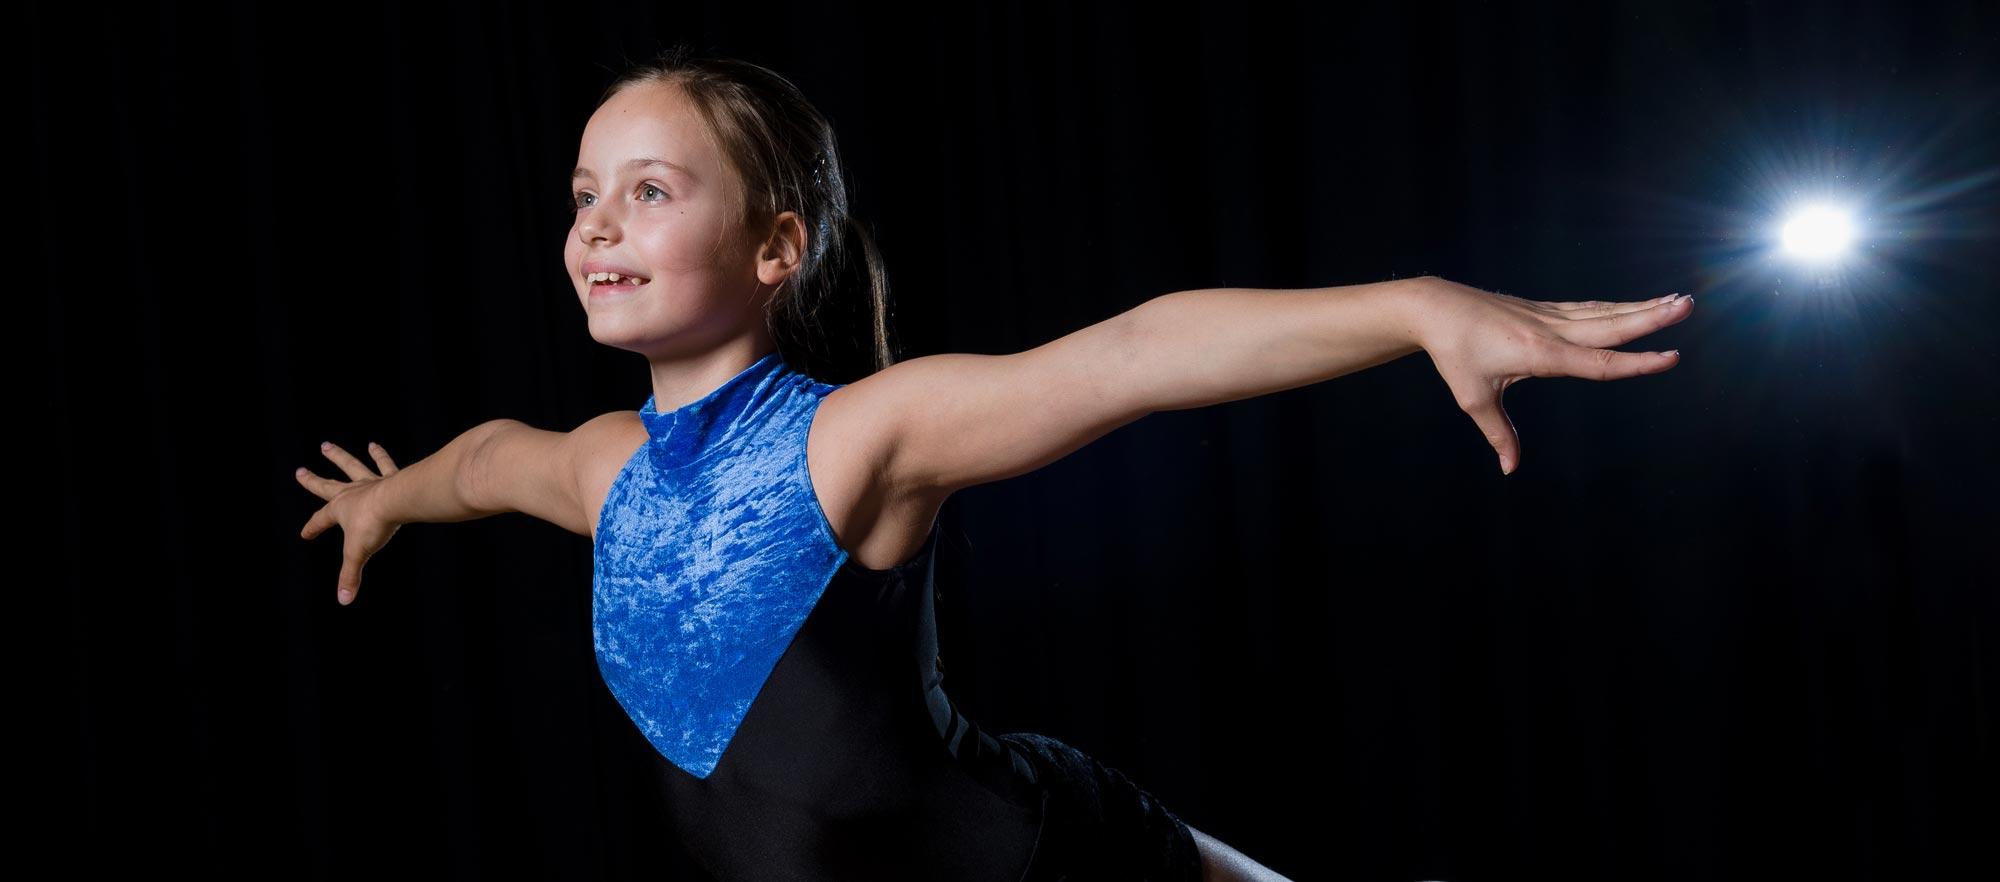 gymnastics-girl